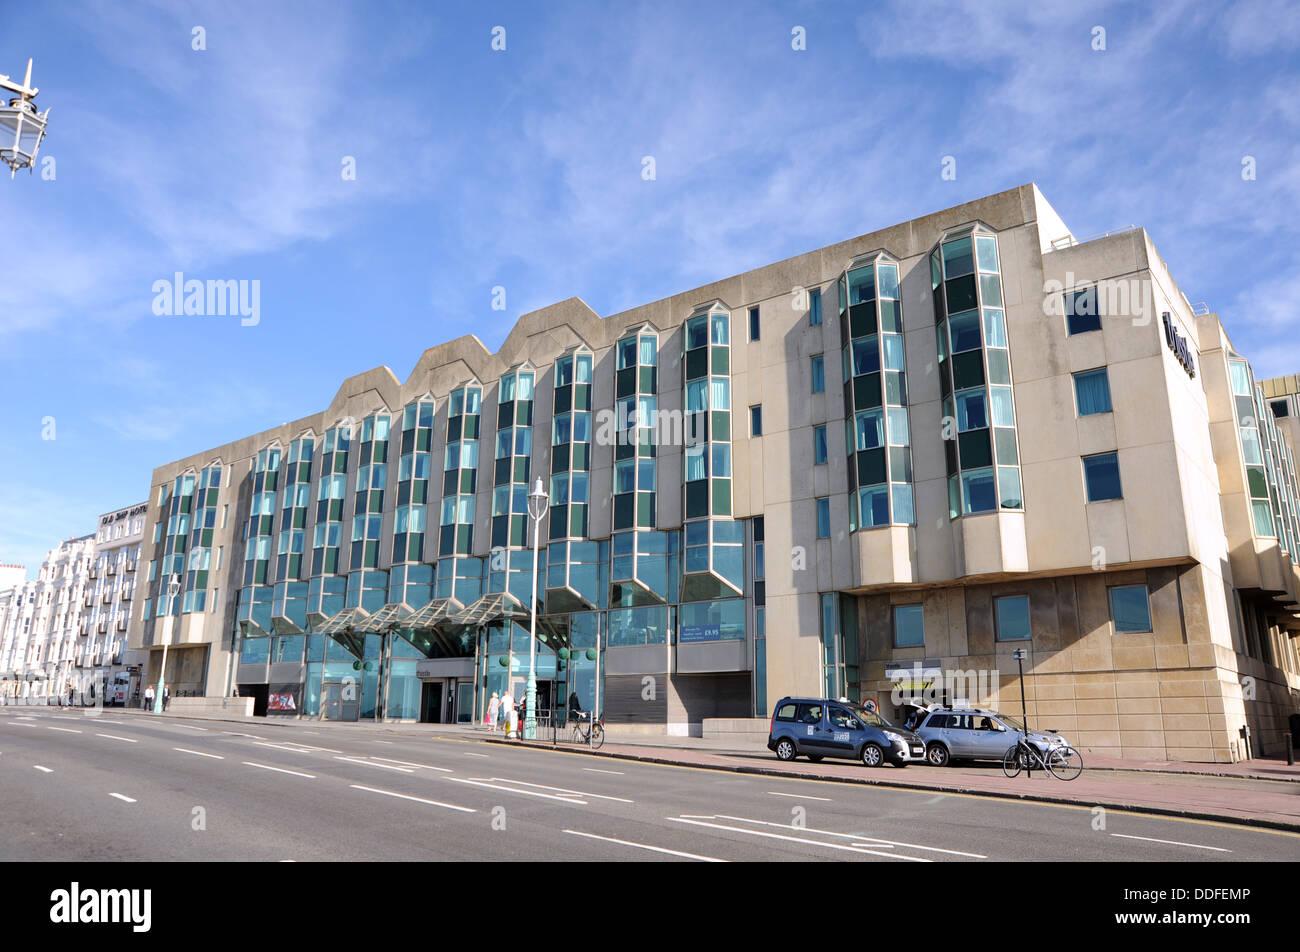 The Thistle Hotel Brighton Seafront Uk Stock Photo 59962470 Alamy